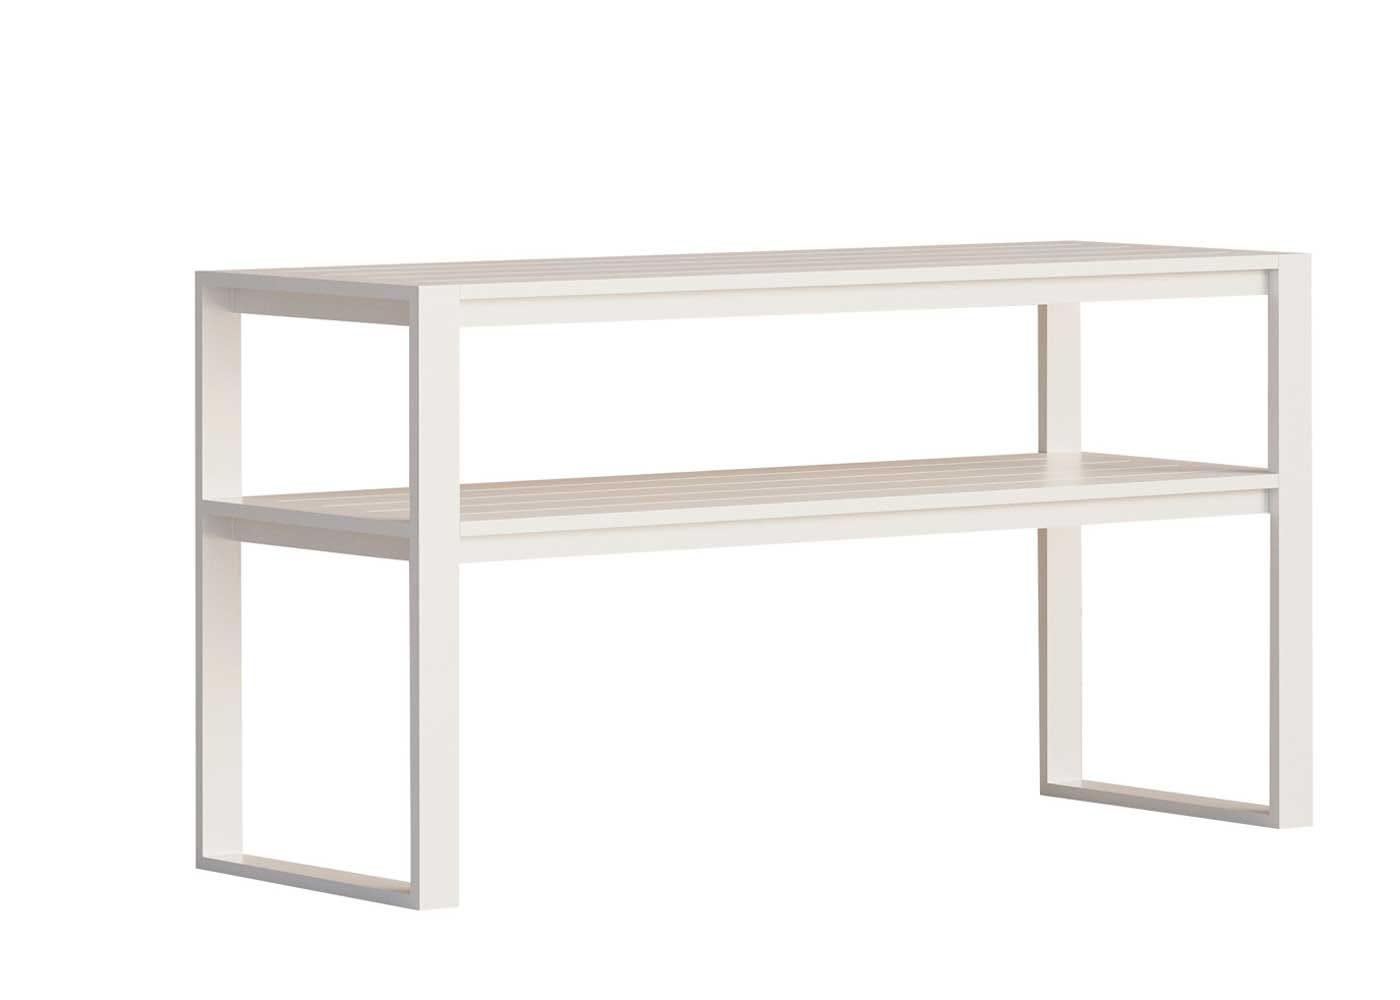 Eos rectangular bar table white